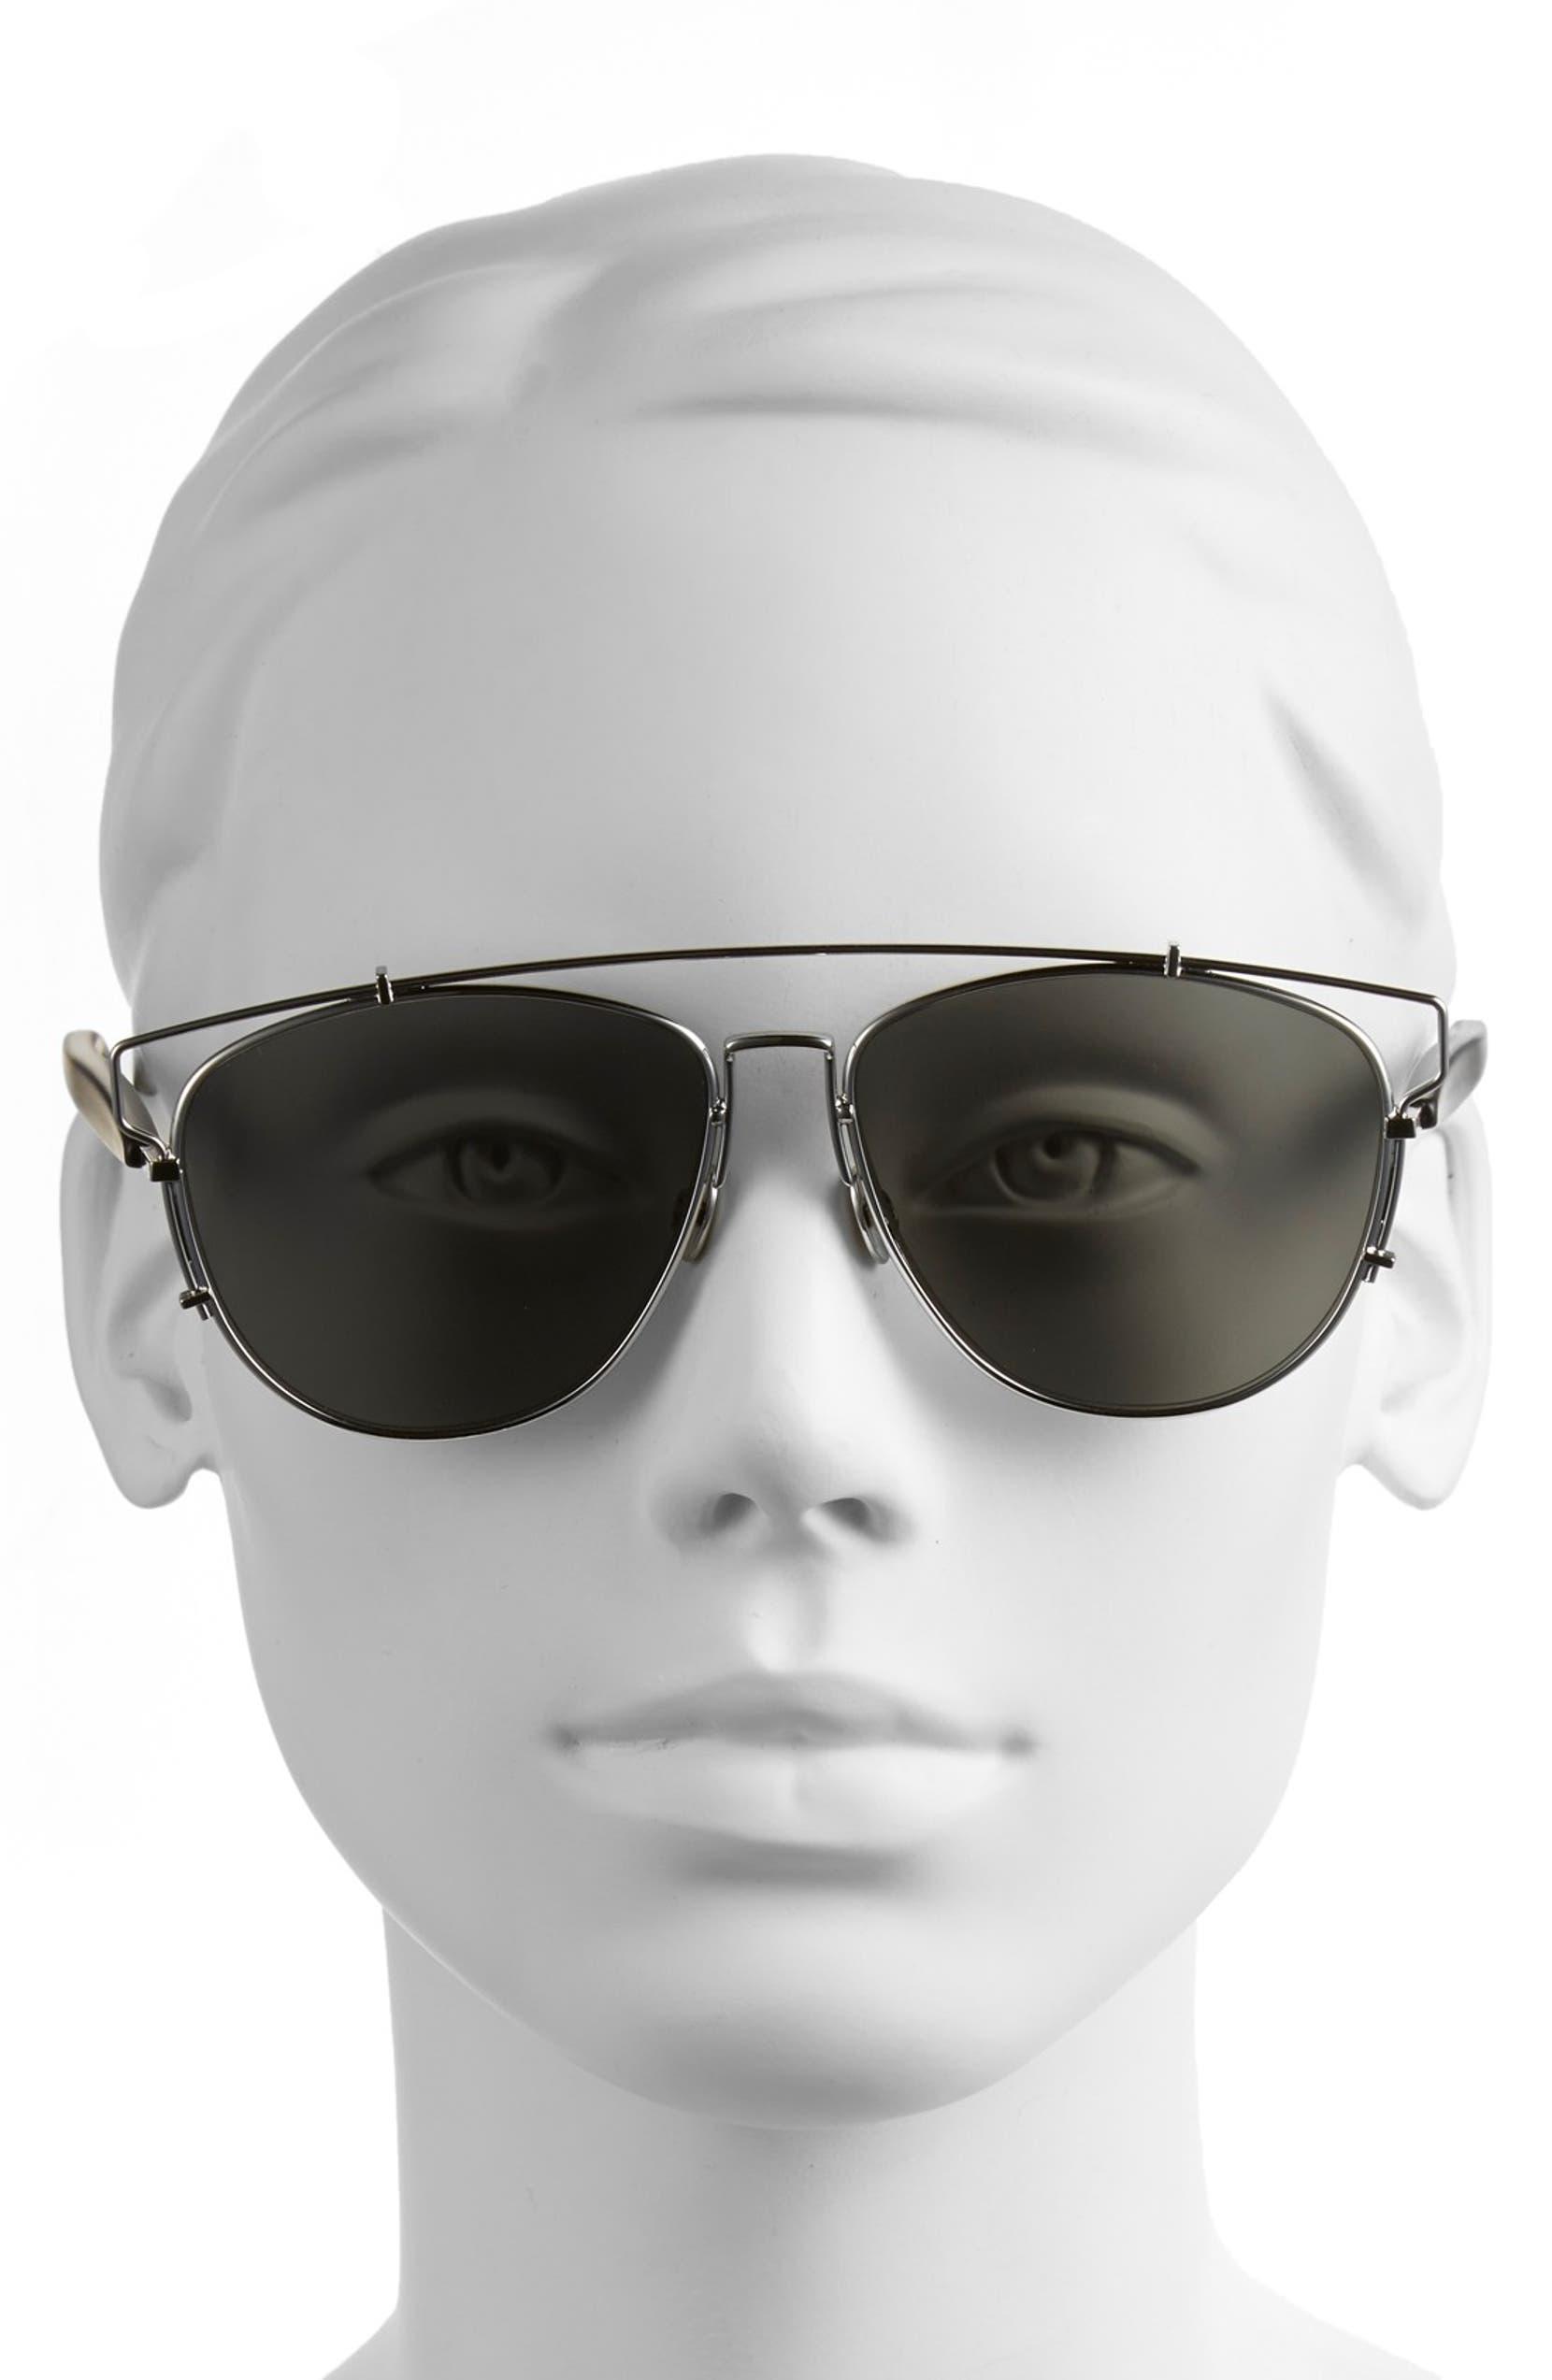 5c1c33b41c21 Dior Technologic 57mm Brow Bar Sunglasses